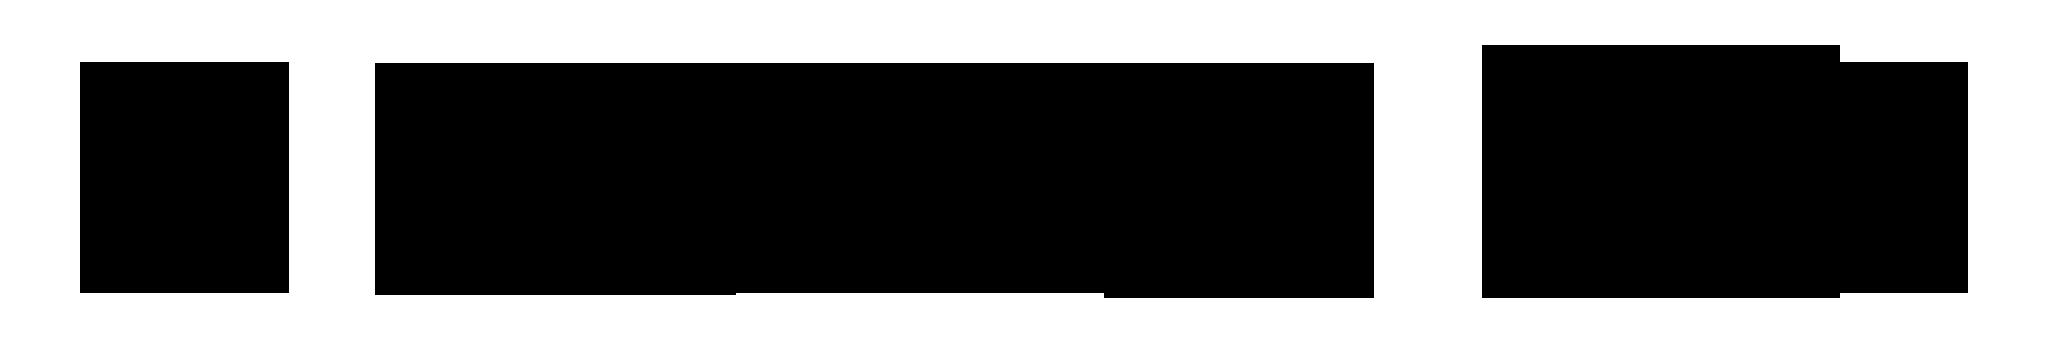 cool-america-logo.png